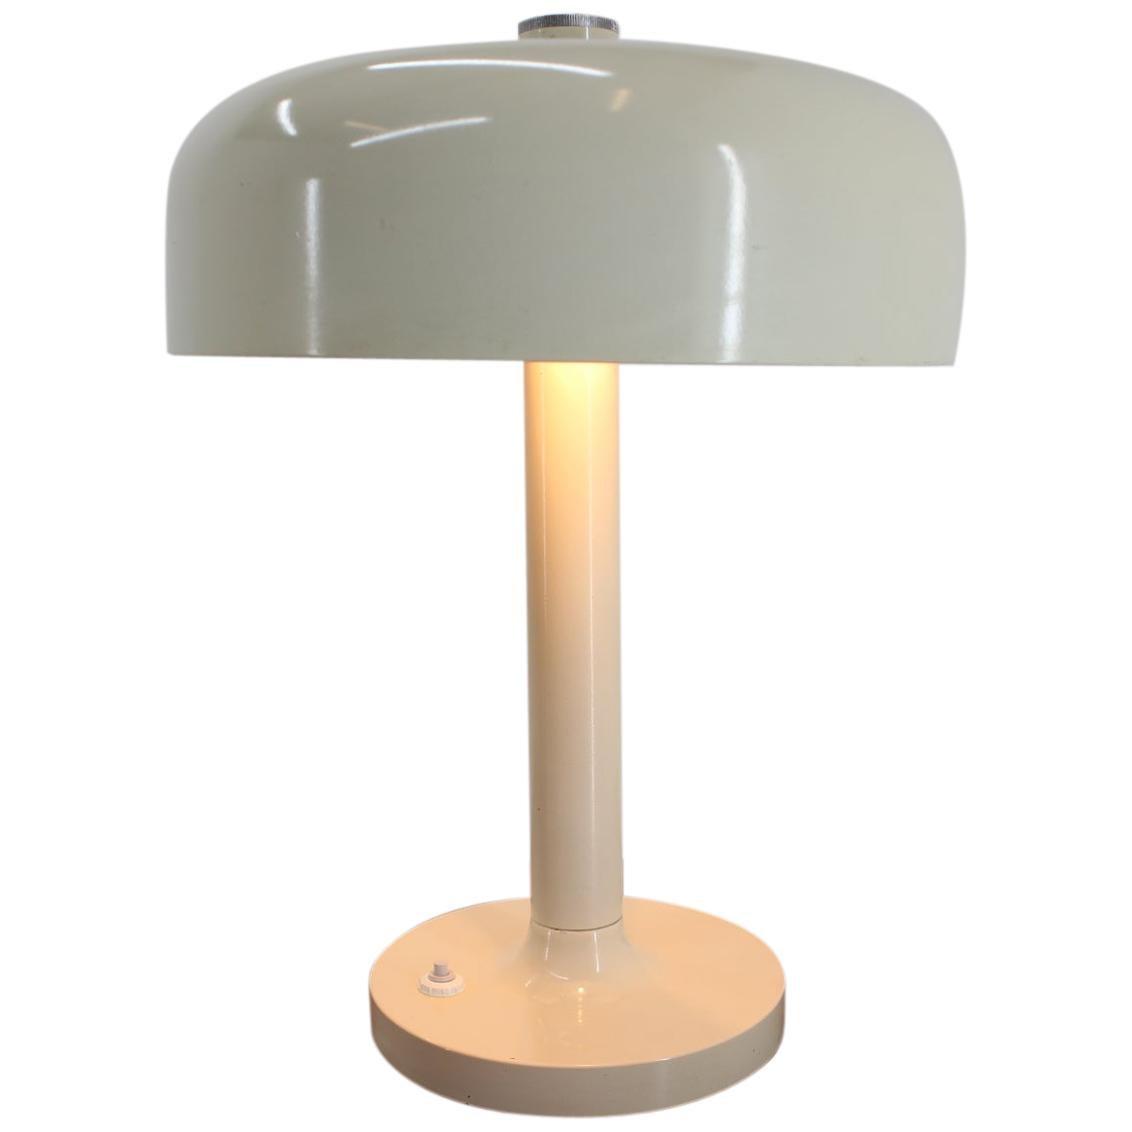 Big Midcentury Design Table Lamp, 1970s